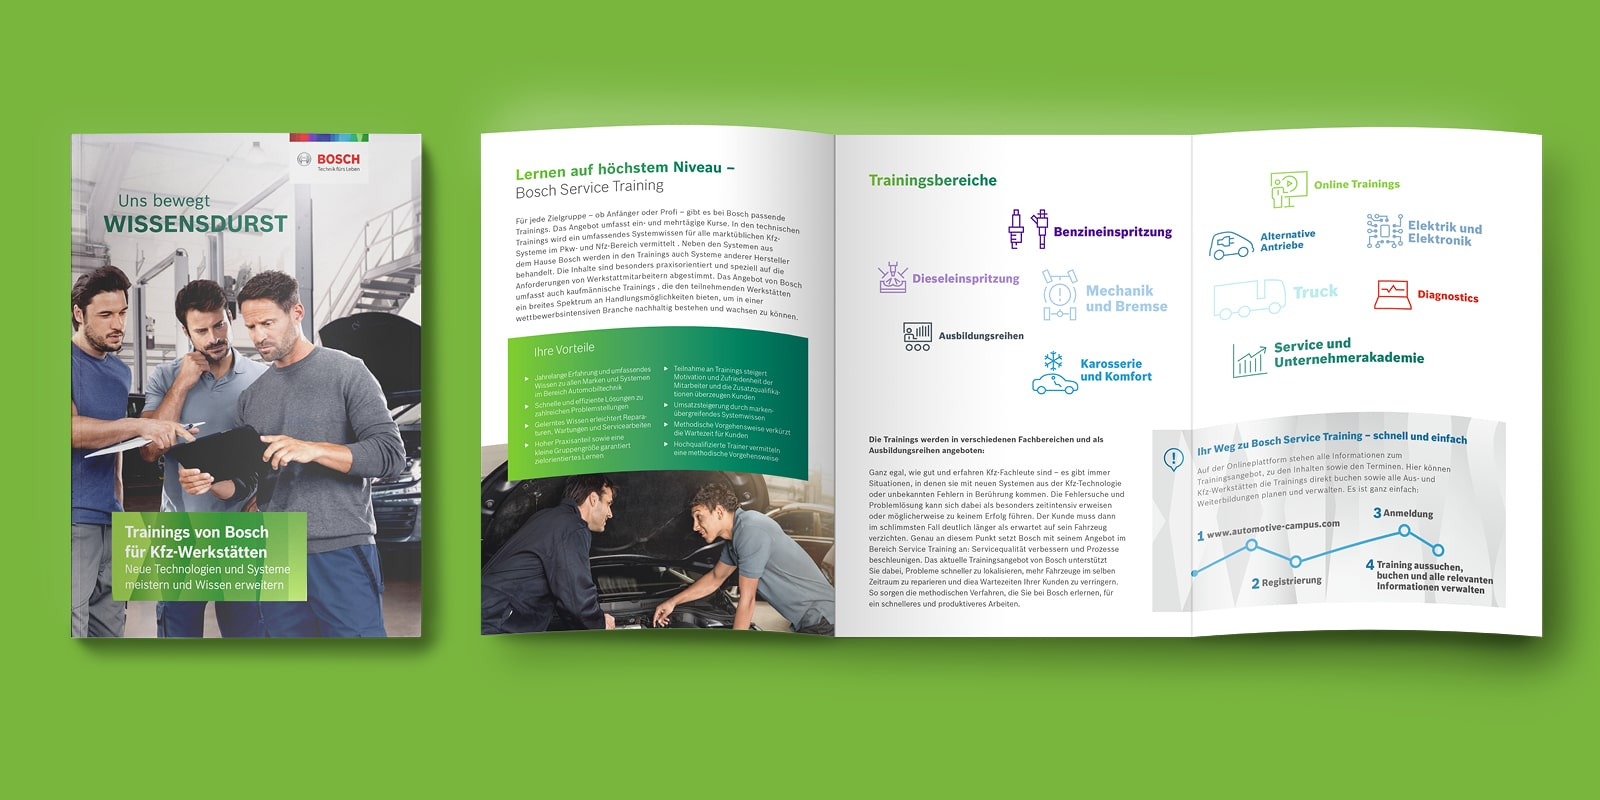 Bosch - Broschüre - Trainings